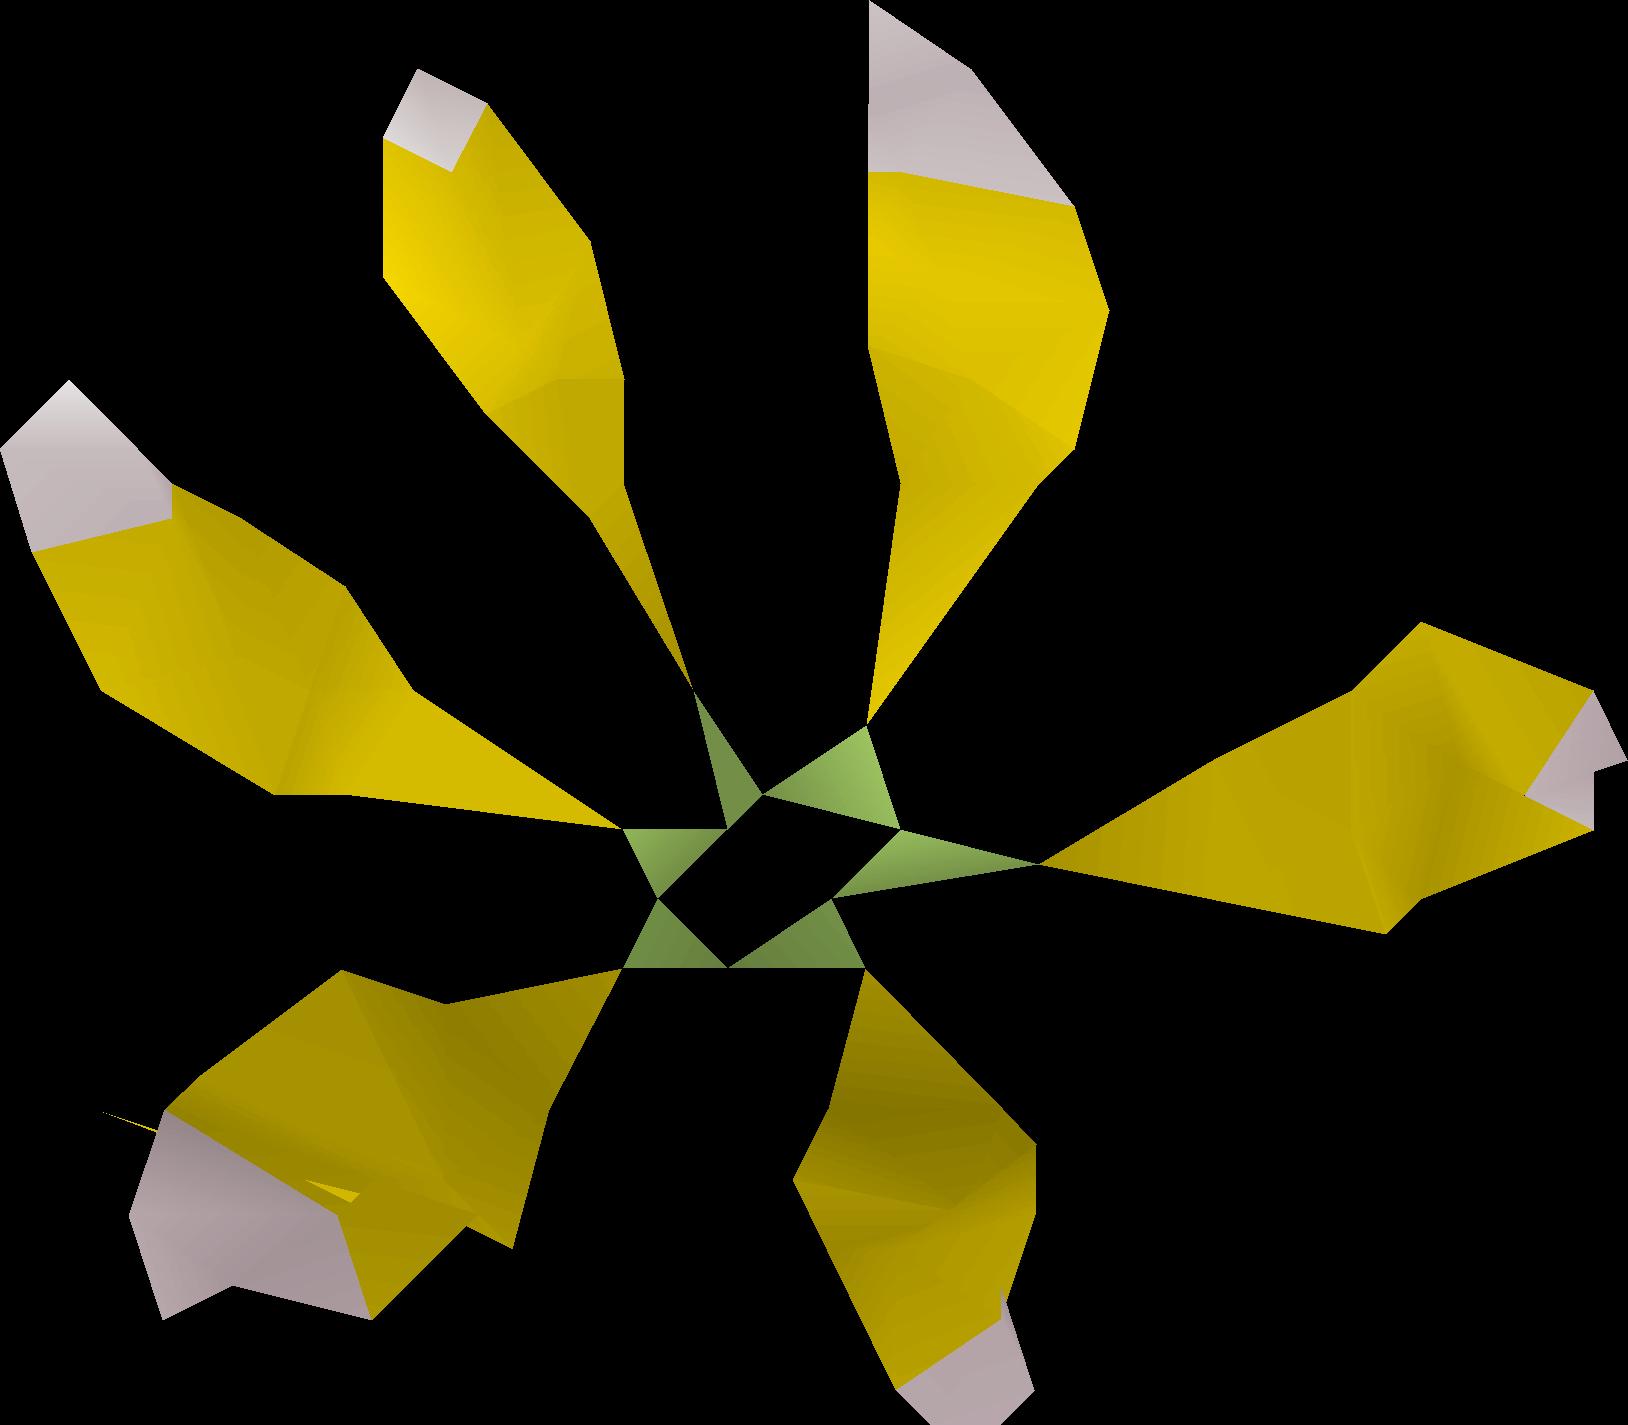 File:Star flower detail.png